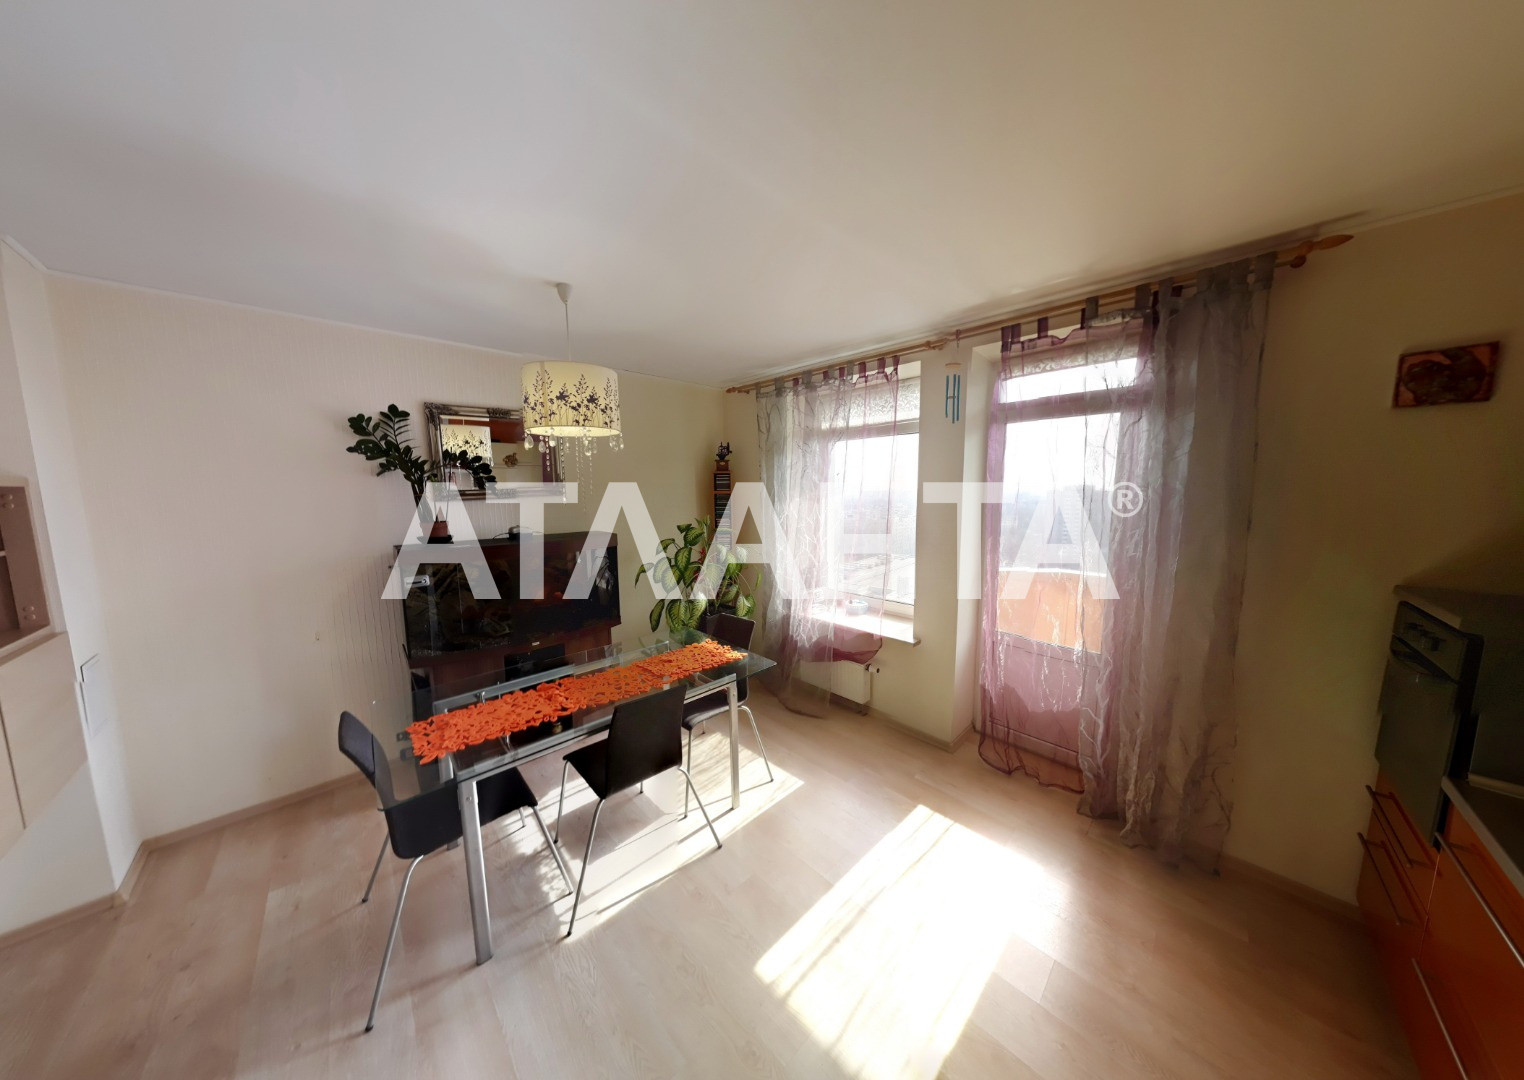 Продается 3-комнатная Квартира на ул. Ломоносова — 118 900 у.е. (фото №13)